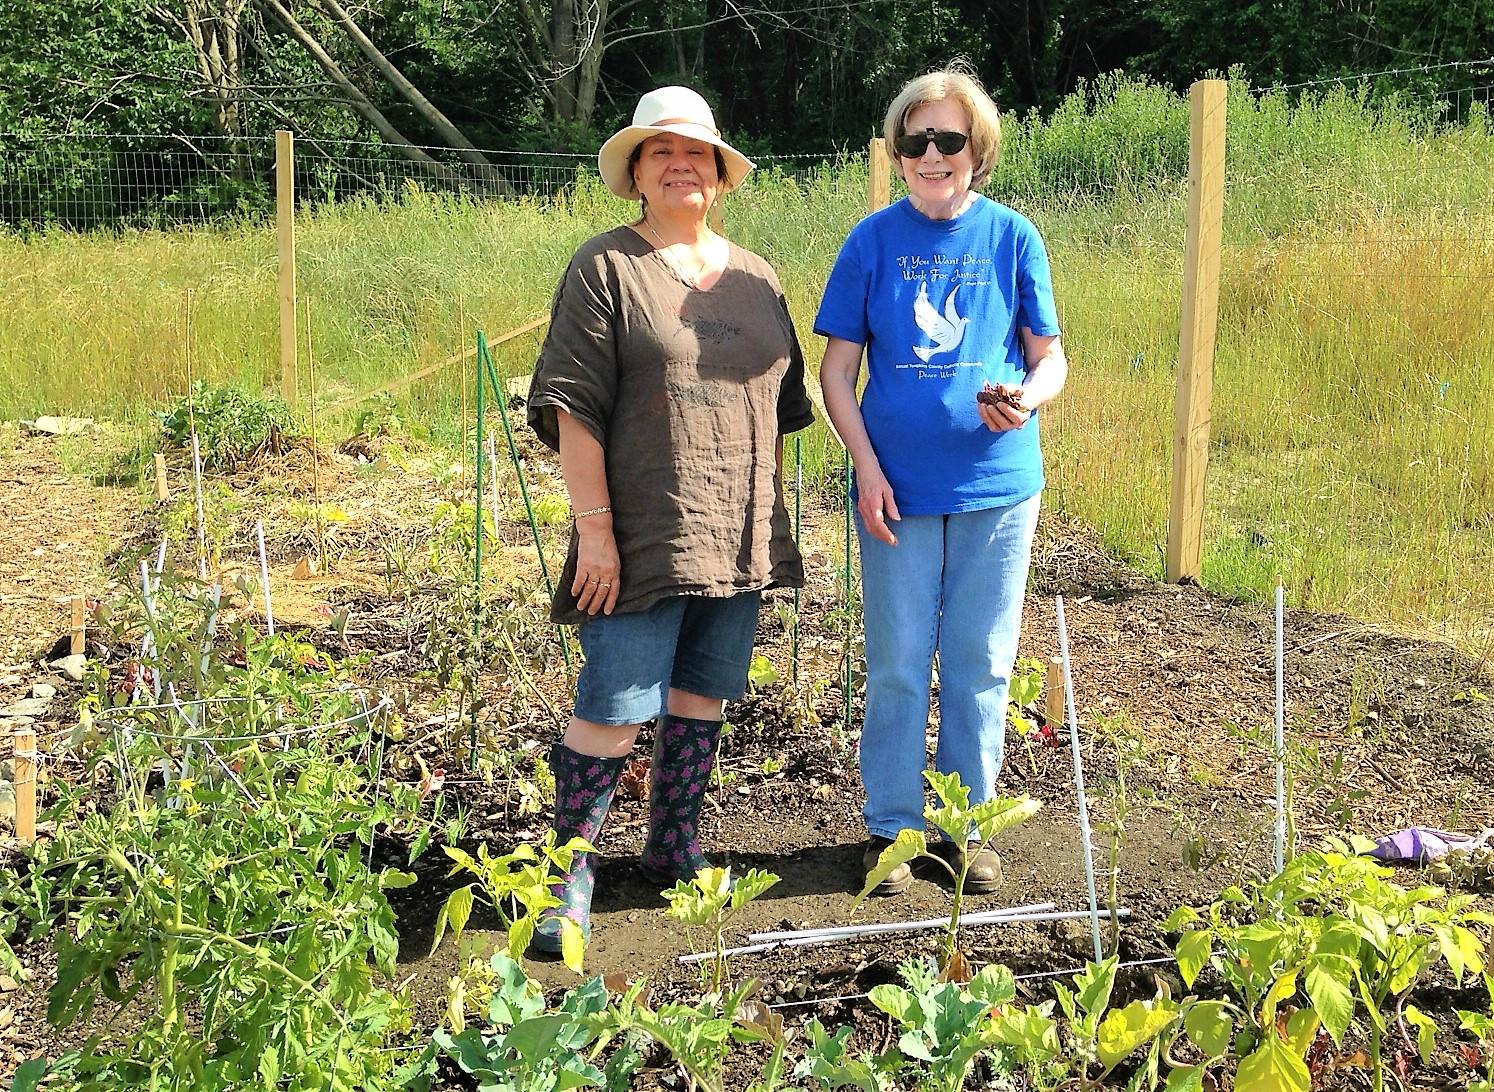 Magnolia Ariza-Nieto (left) and Pat Frazier in the community garden at the Cayuga Meadows Senior Apartments (photo: Liz Mahood)